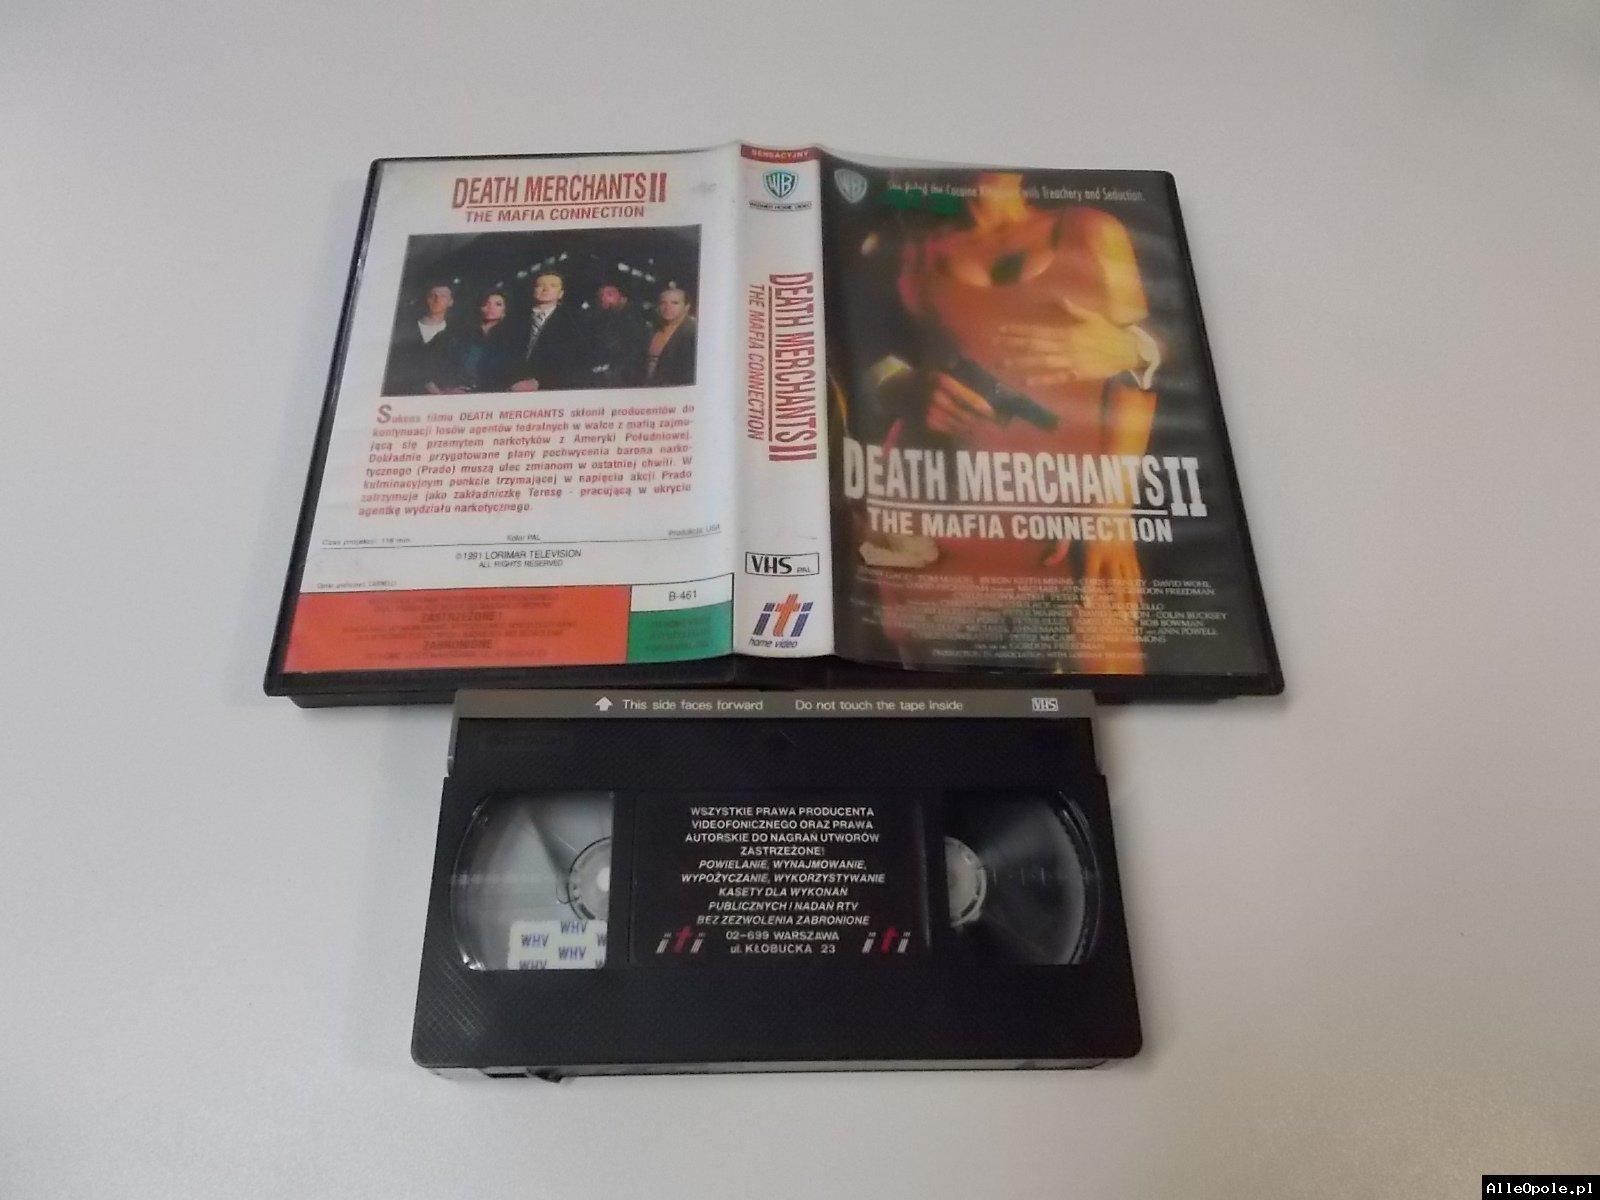 HANDLARZE ŚMIERCIĄ 2 - VHS Kaseta Video - Opole 1709